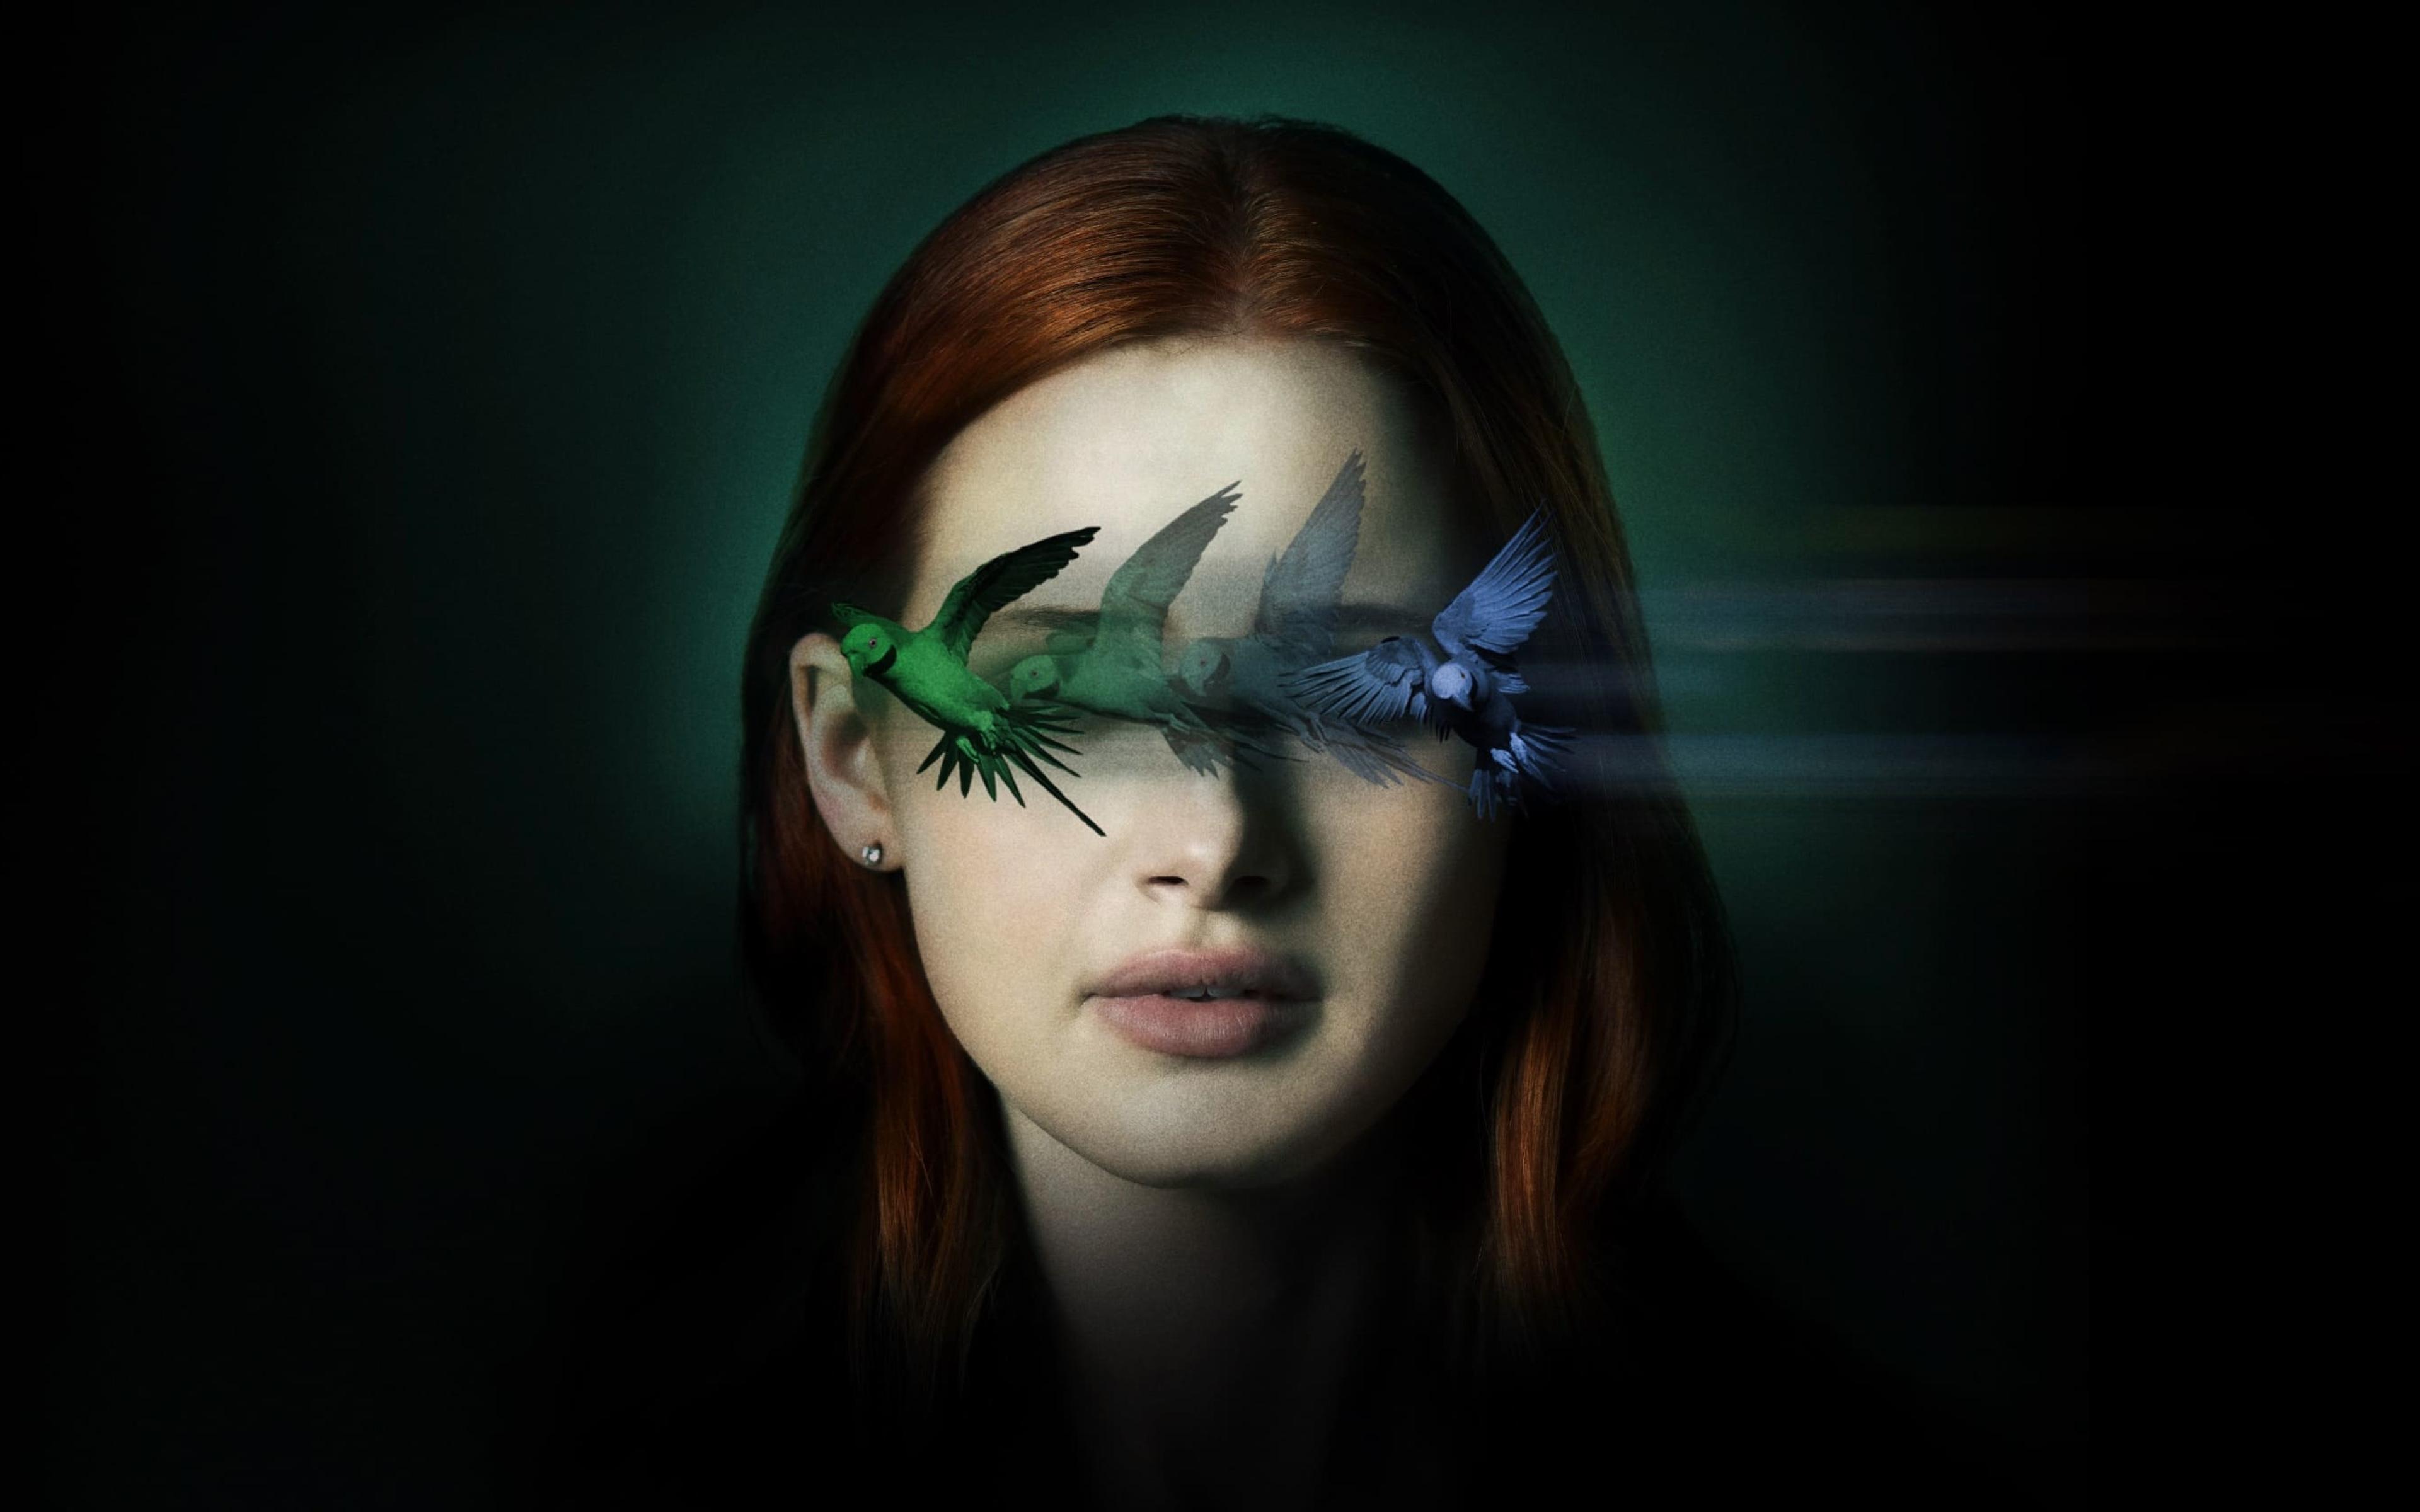 Madelaine Petsch Sightless Movie Wallpaper in 3840x2400 Resolution